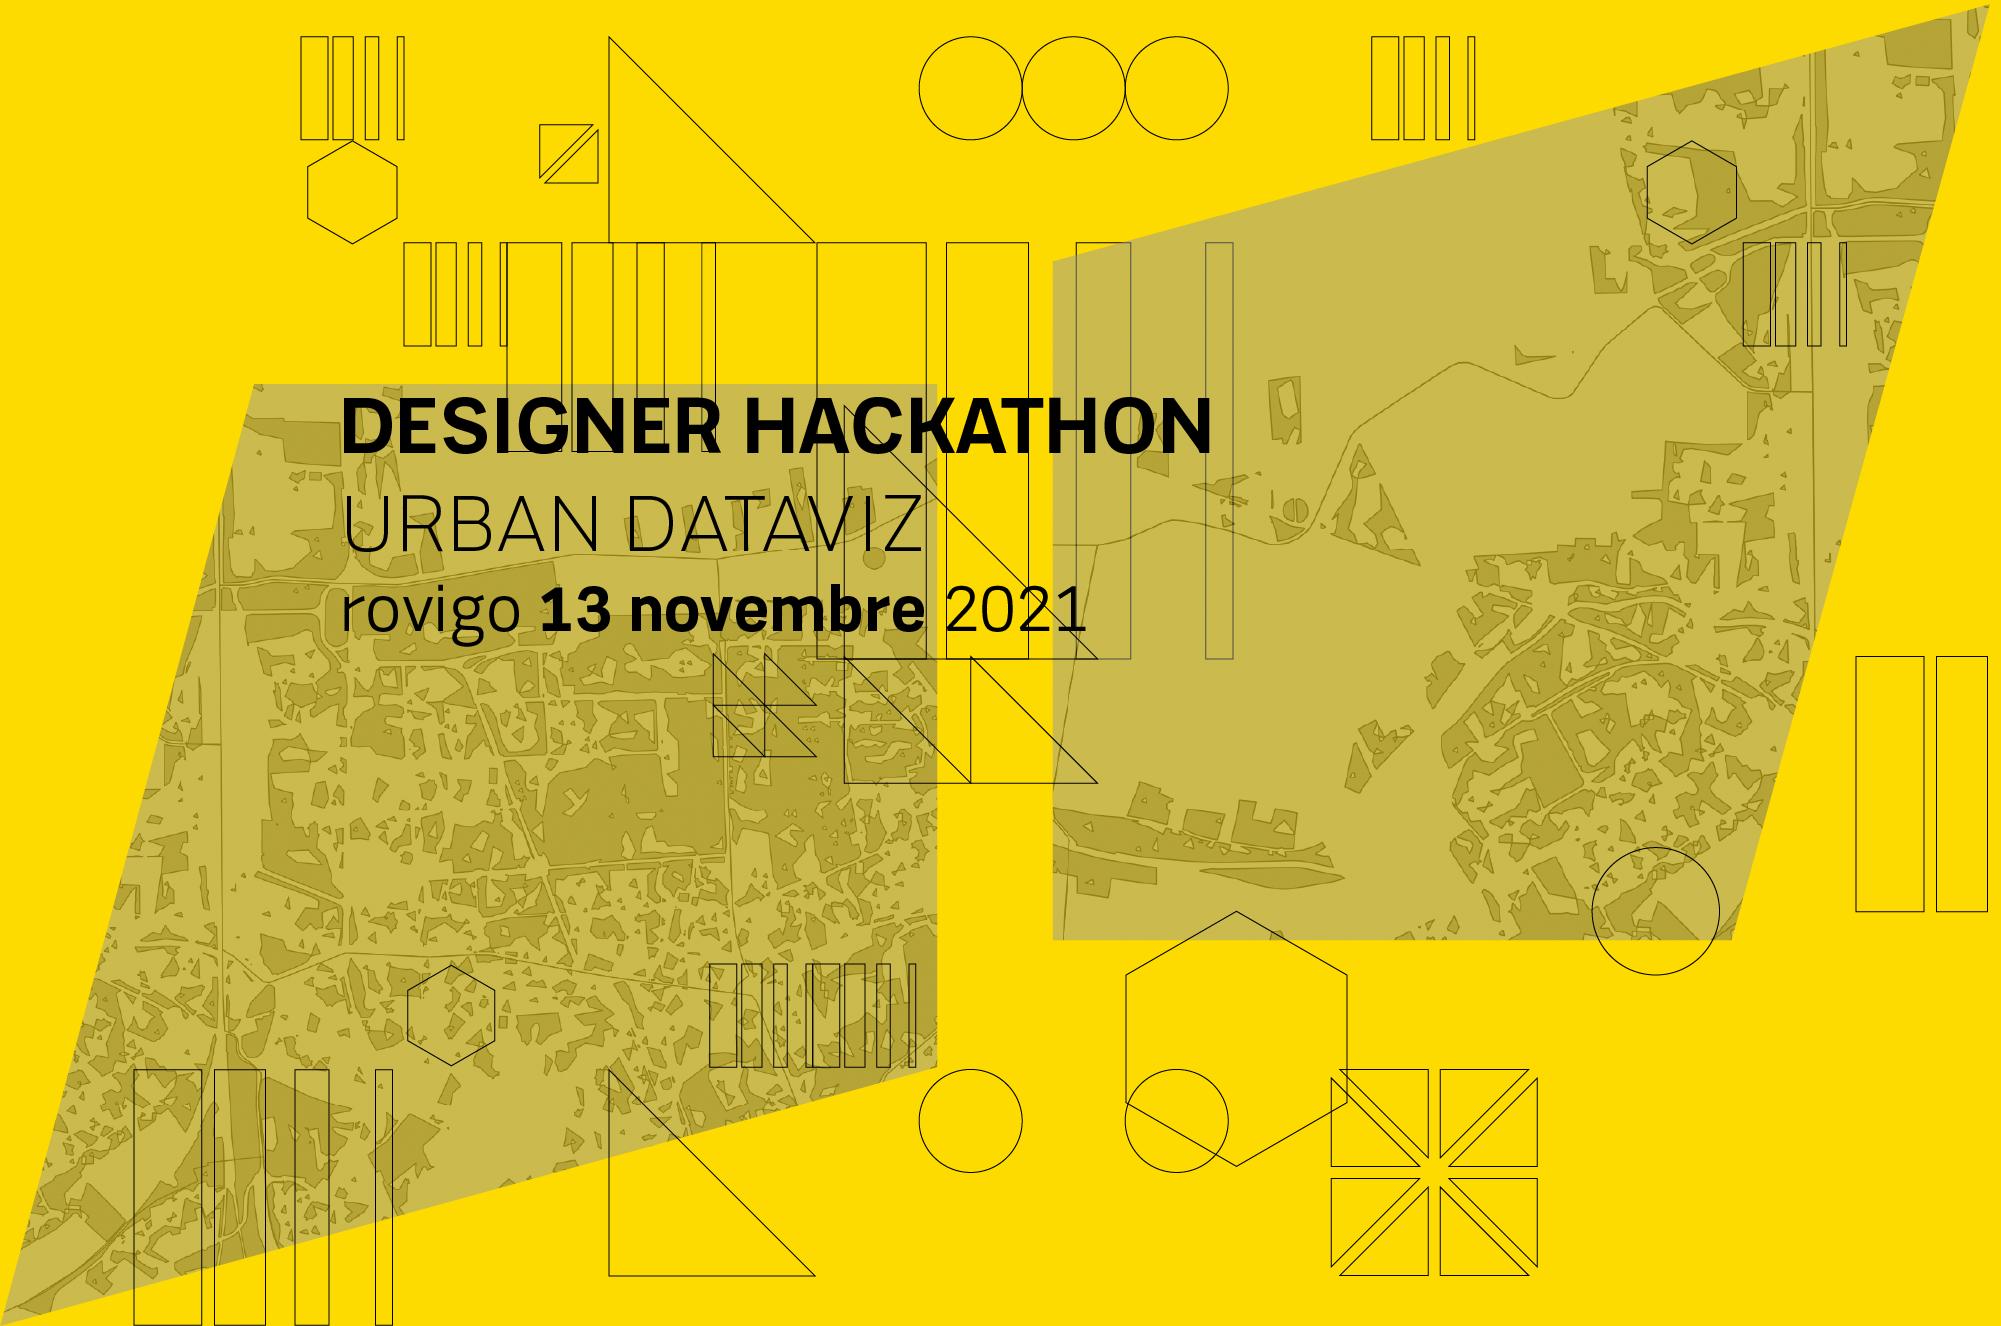 designer hackathon urban dataviz